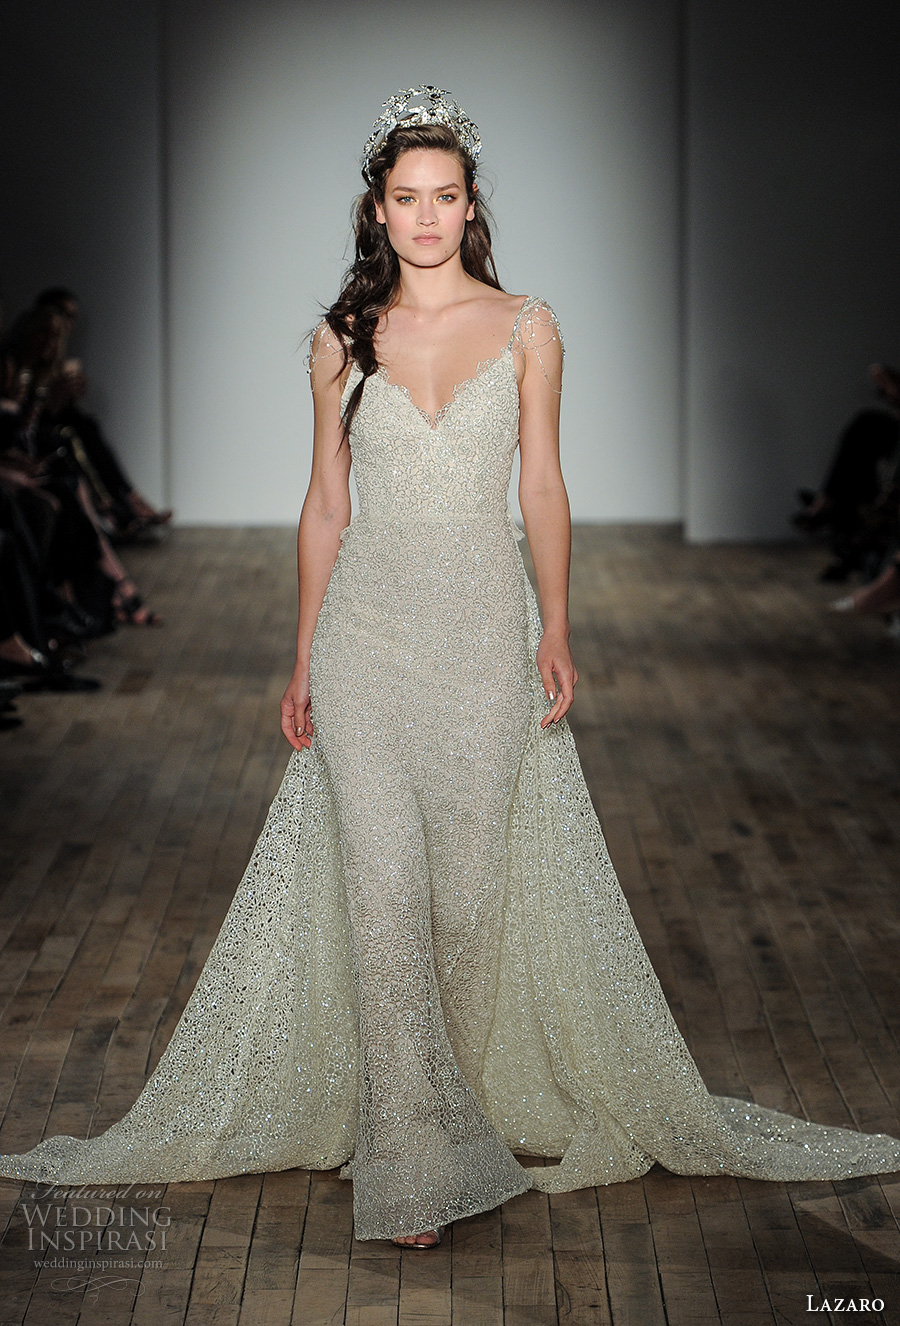 Lazaro Fall 2017 Wedding Dresses New York Bridal Fashion Week Runway Show Wedding Inspirasi